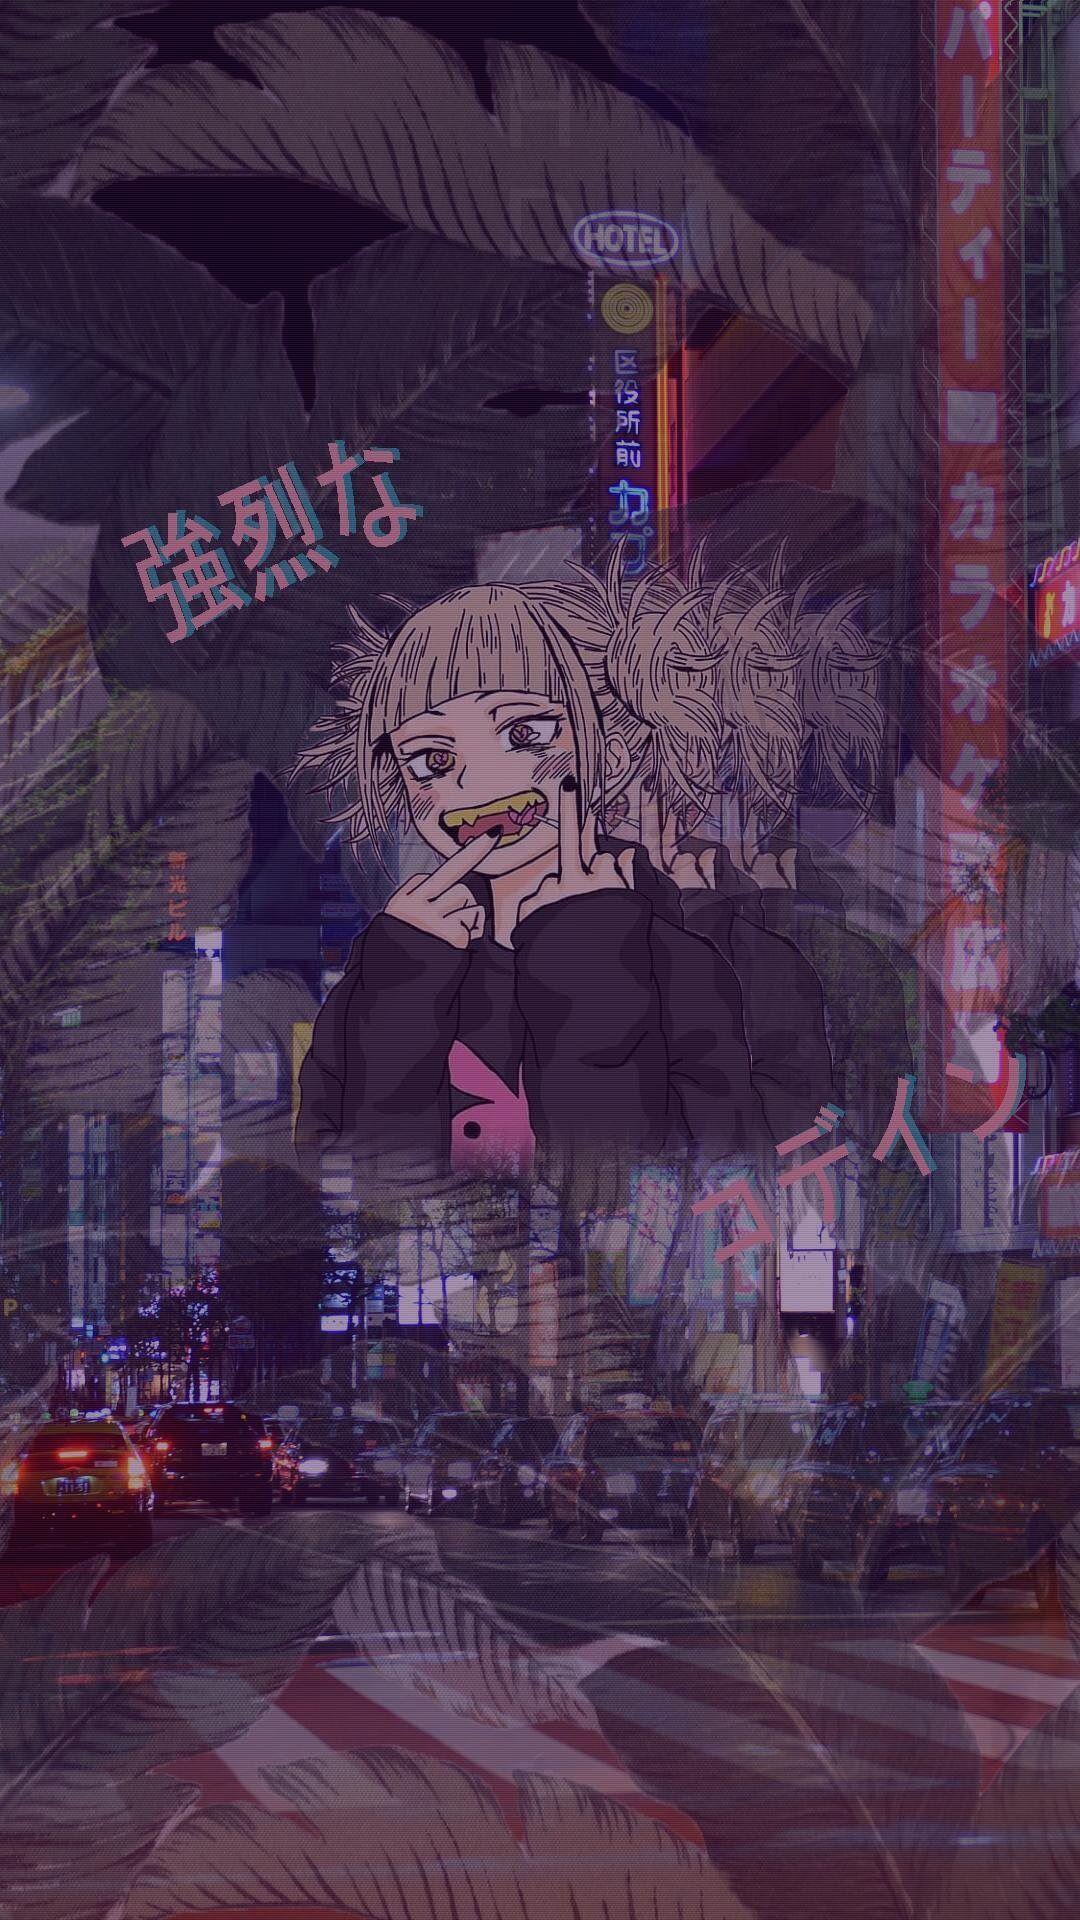 Aesthetic Wallpapers In 2020 Anime Wallpaper Vaporwave Wallpaper Anime Wallpaper Iphone